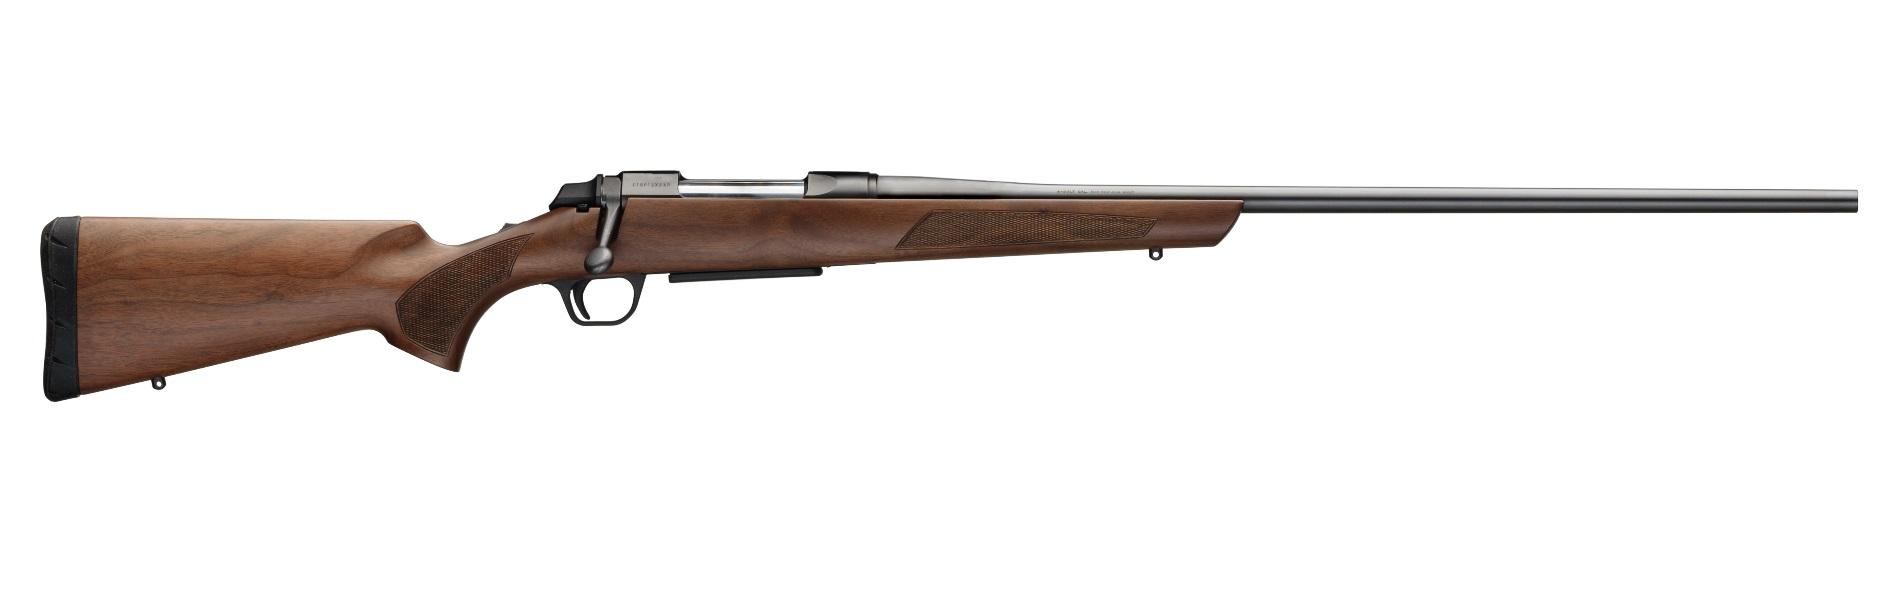 Browning A-Bolt III Hunter 243 Win